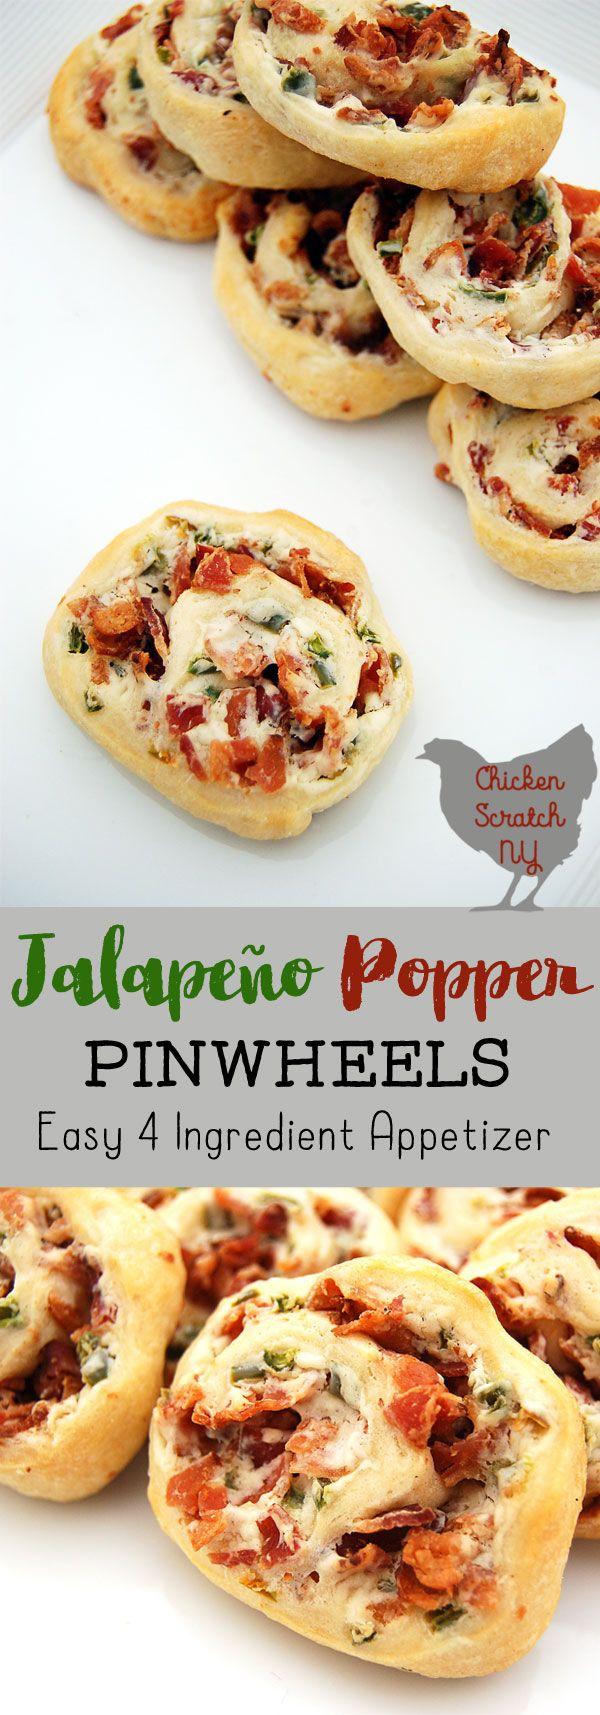 #appetizer #jalapeno #crescentroll #4ingredients via @AleciaCSNY